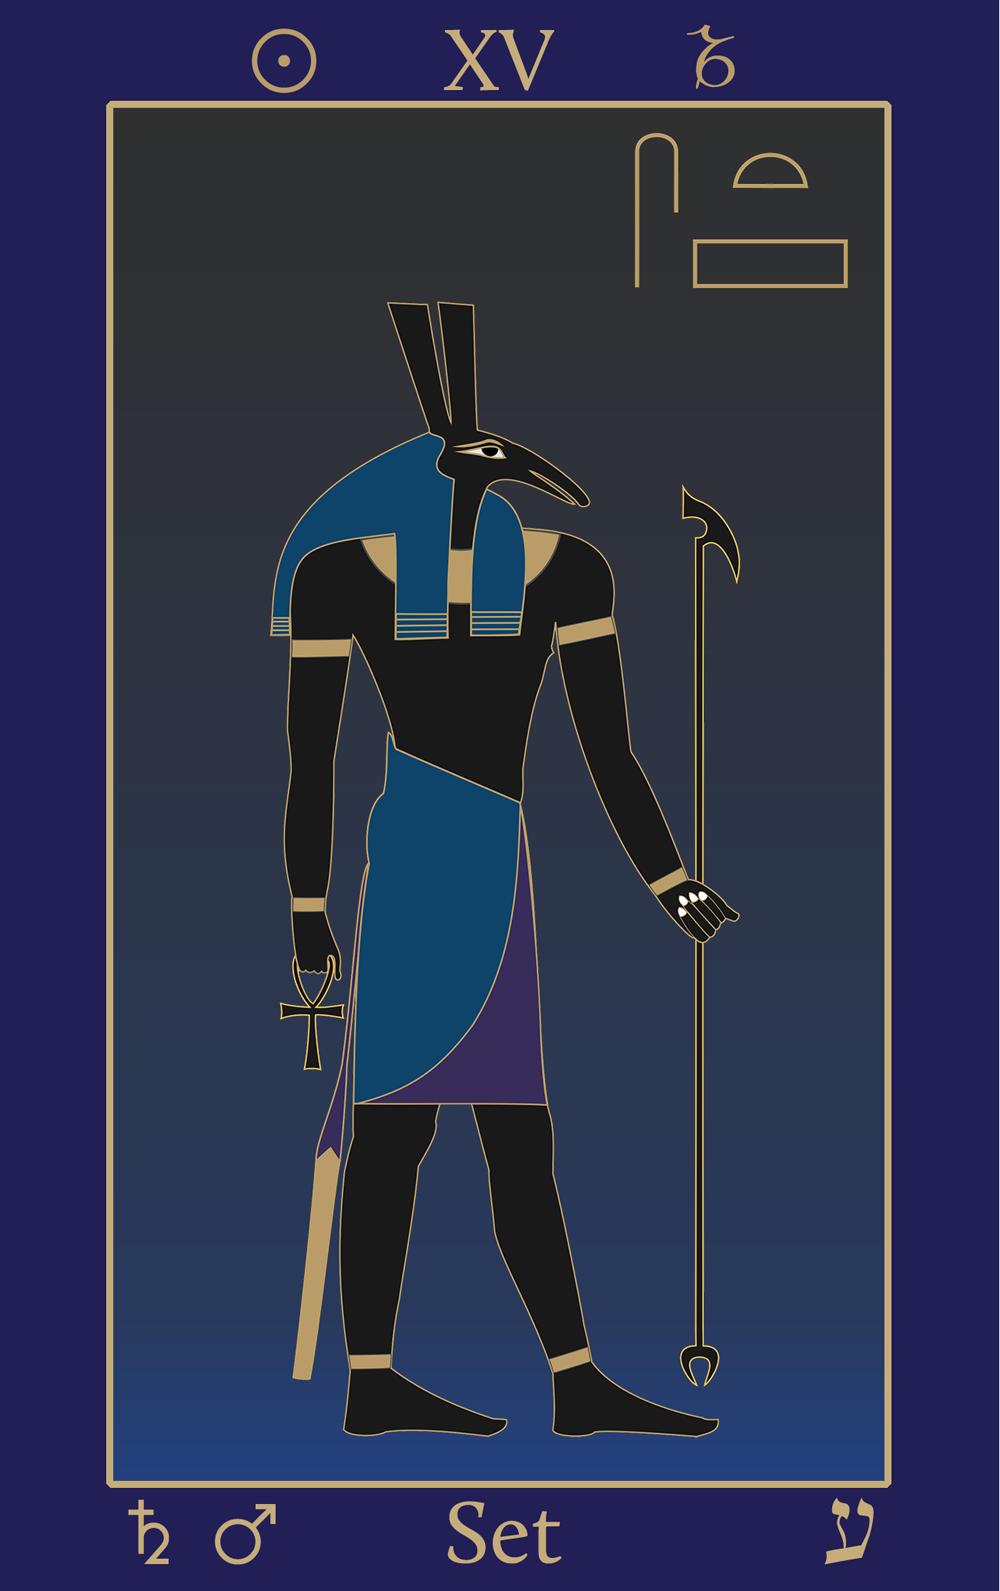 Capricorn Solstice: Egyptian Tarot of Thelema Set XV